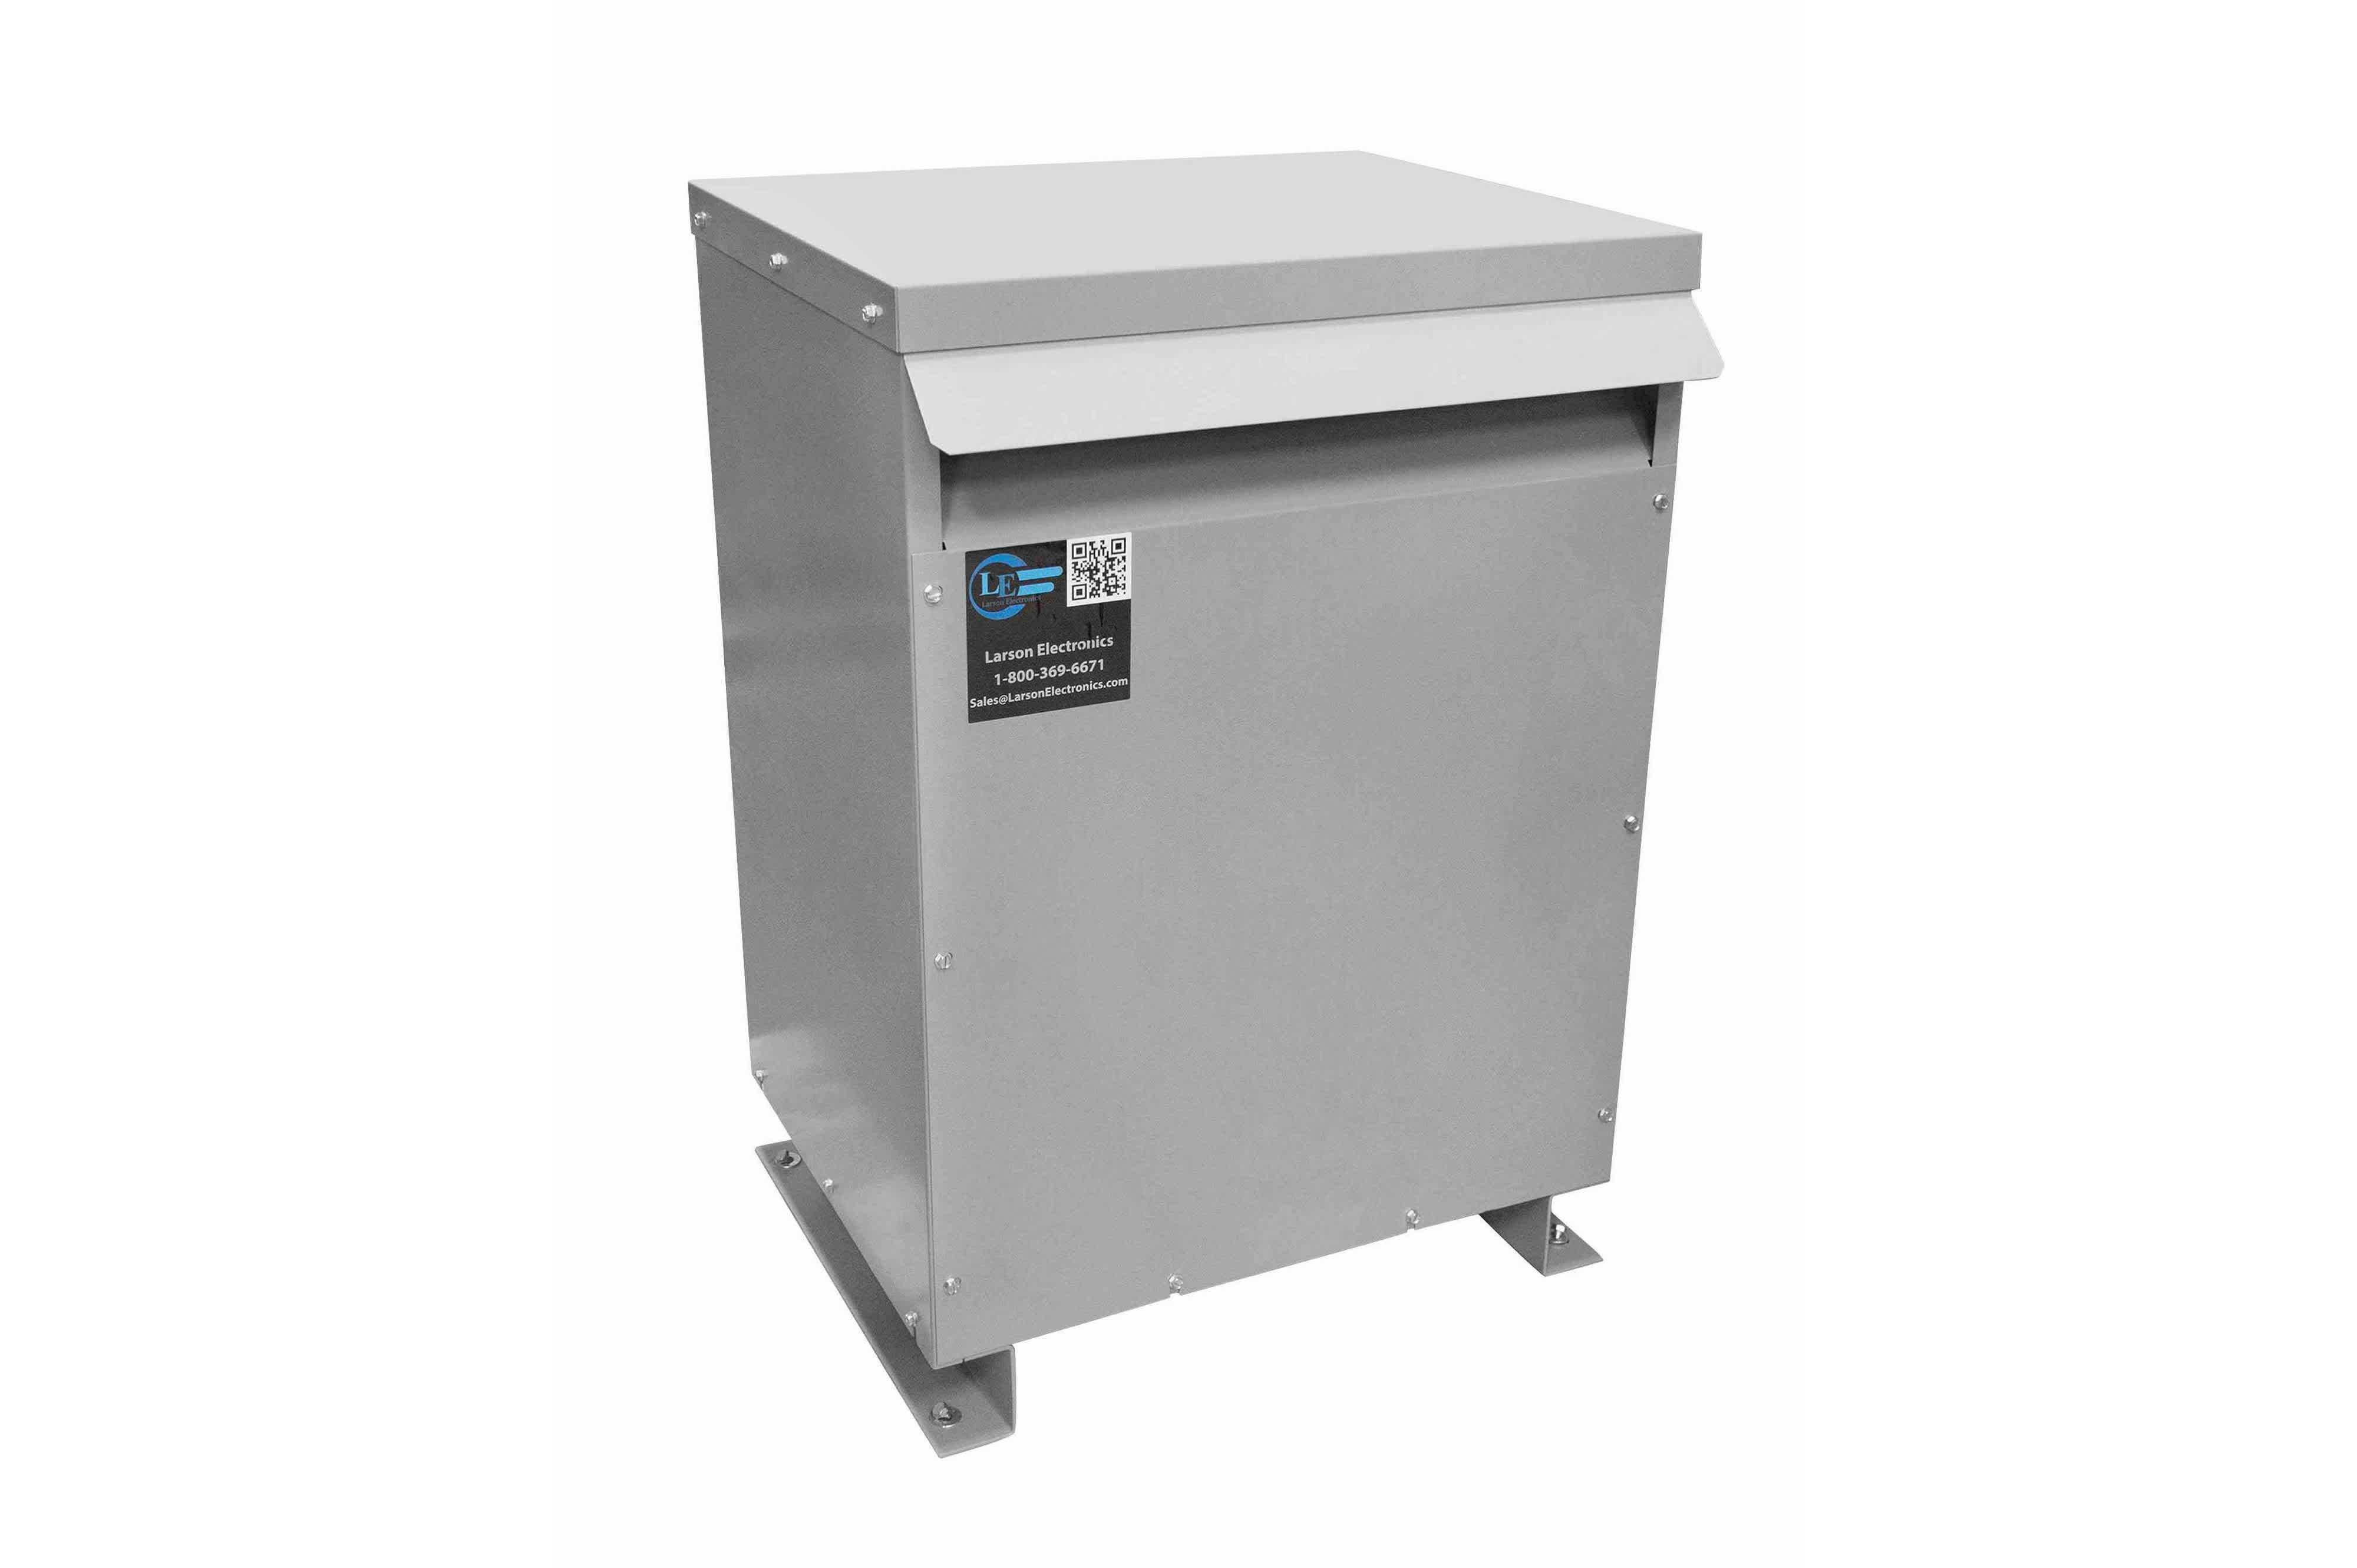 100 kVA 3PH Isolation Transformer, 480V Wye Primary, 600V Delta Secondary, N3R, Ventilated, 60 Hz